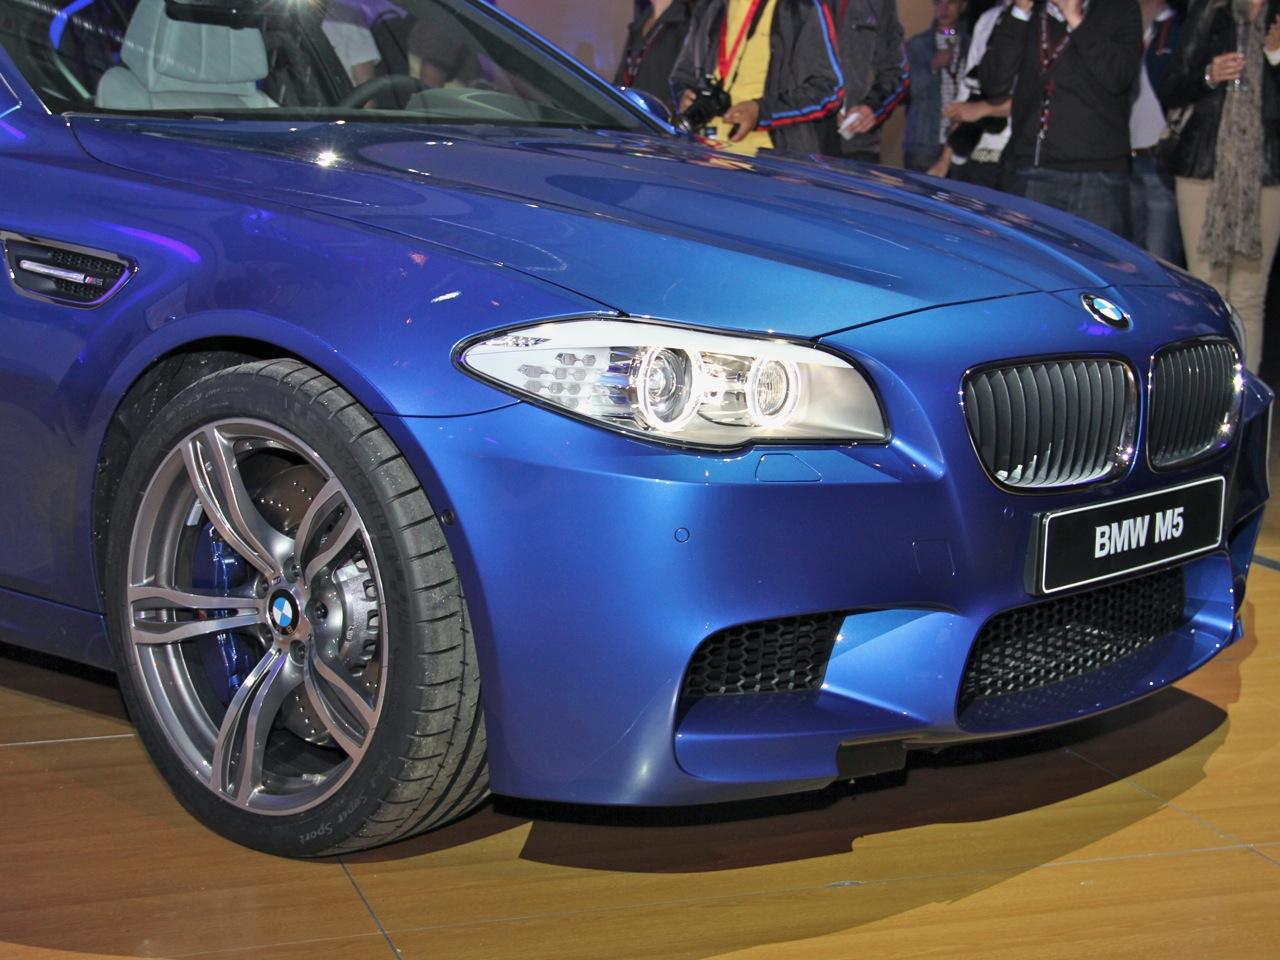 2012 Bmw M5 Uneviled At Nurburgring 24 Hour Vivid Car